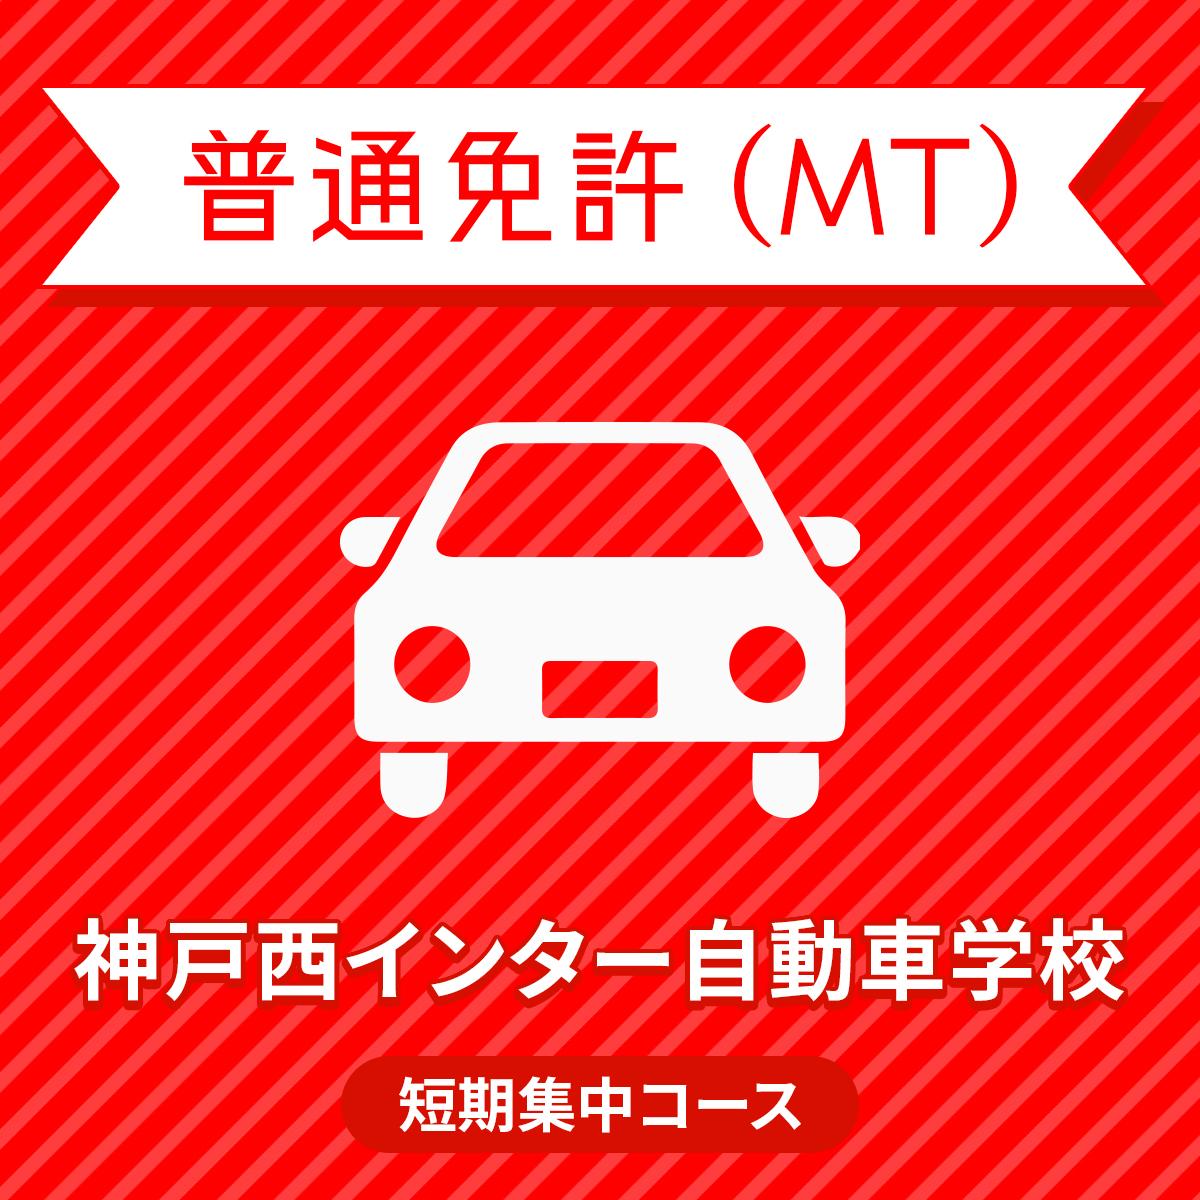 【兵庫県神戸市】普通車MT短期集中コース(一般料金)<免許なし/原付免許所持対象>